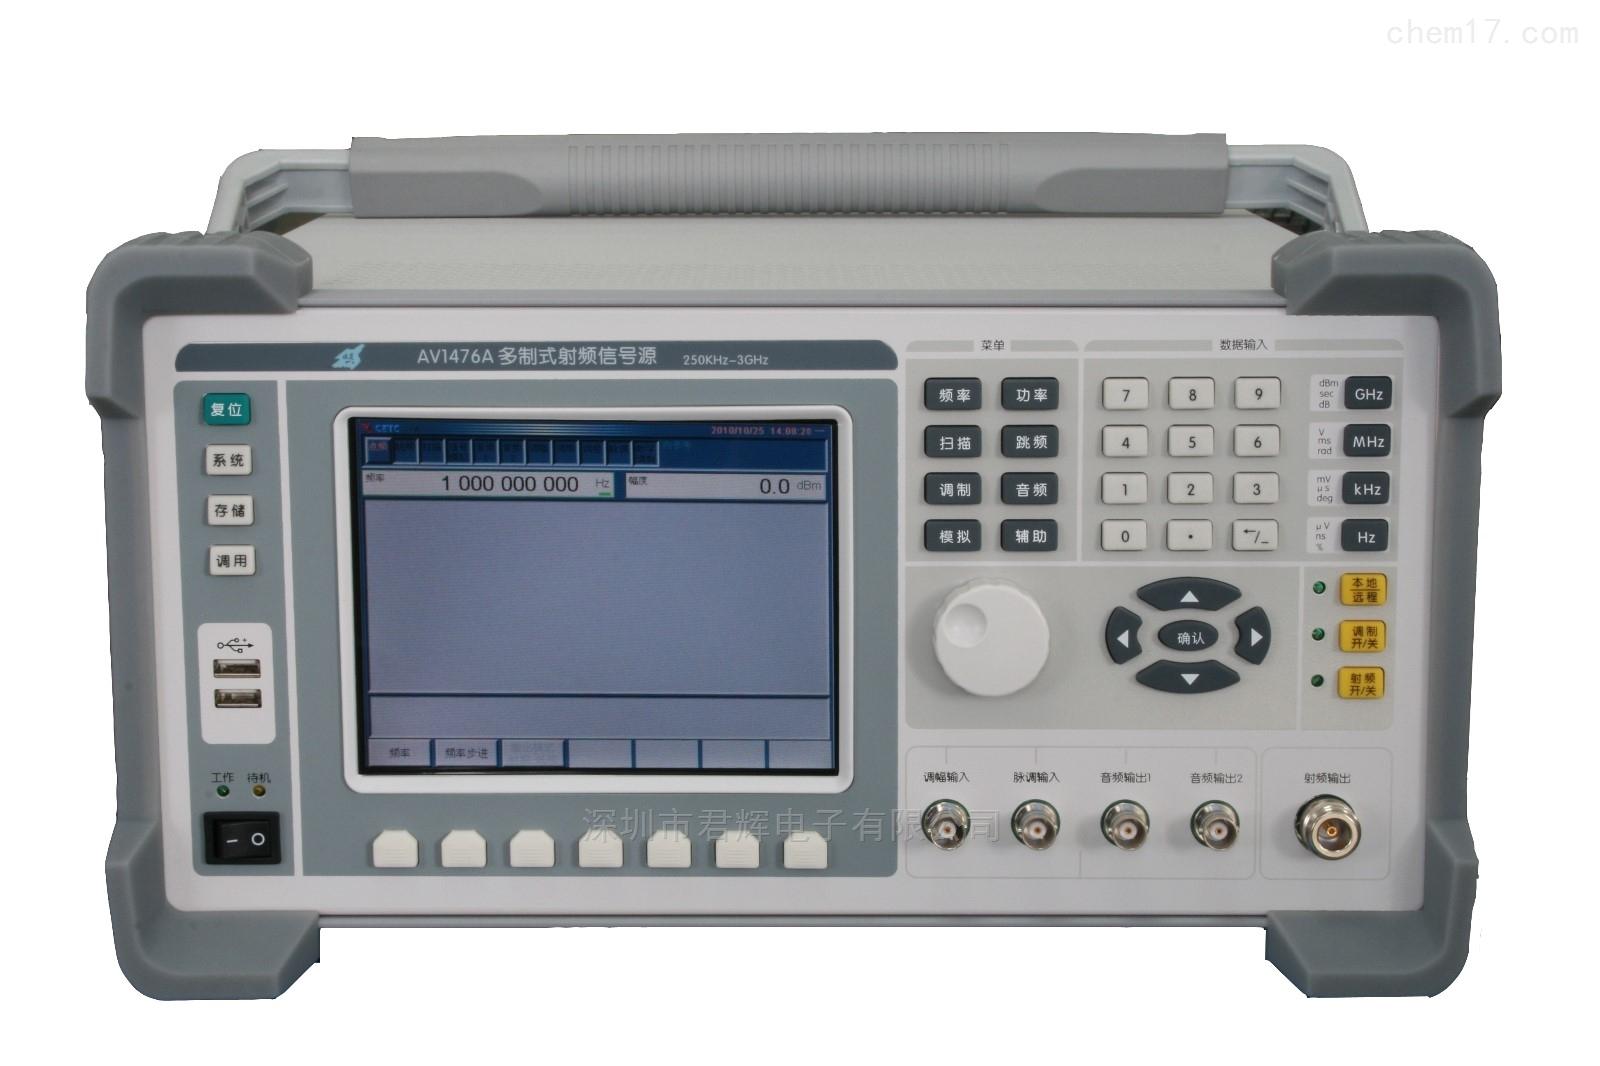 ceyear思仪1476/A/B多制式射频/微波信号源